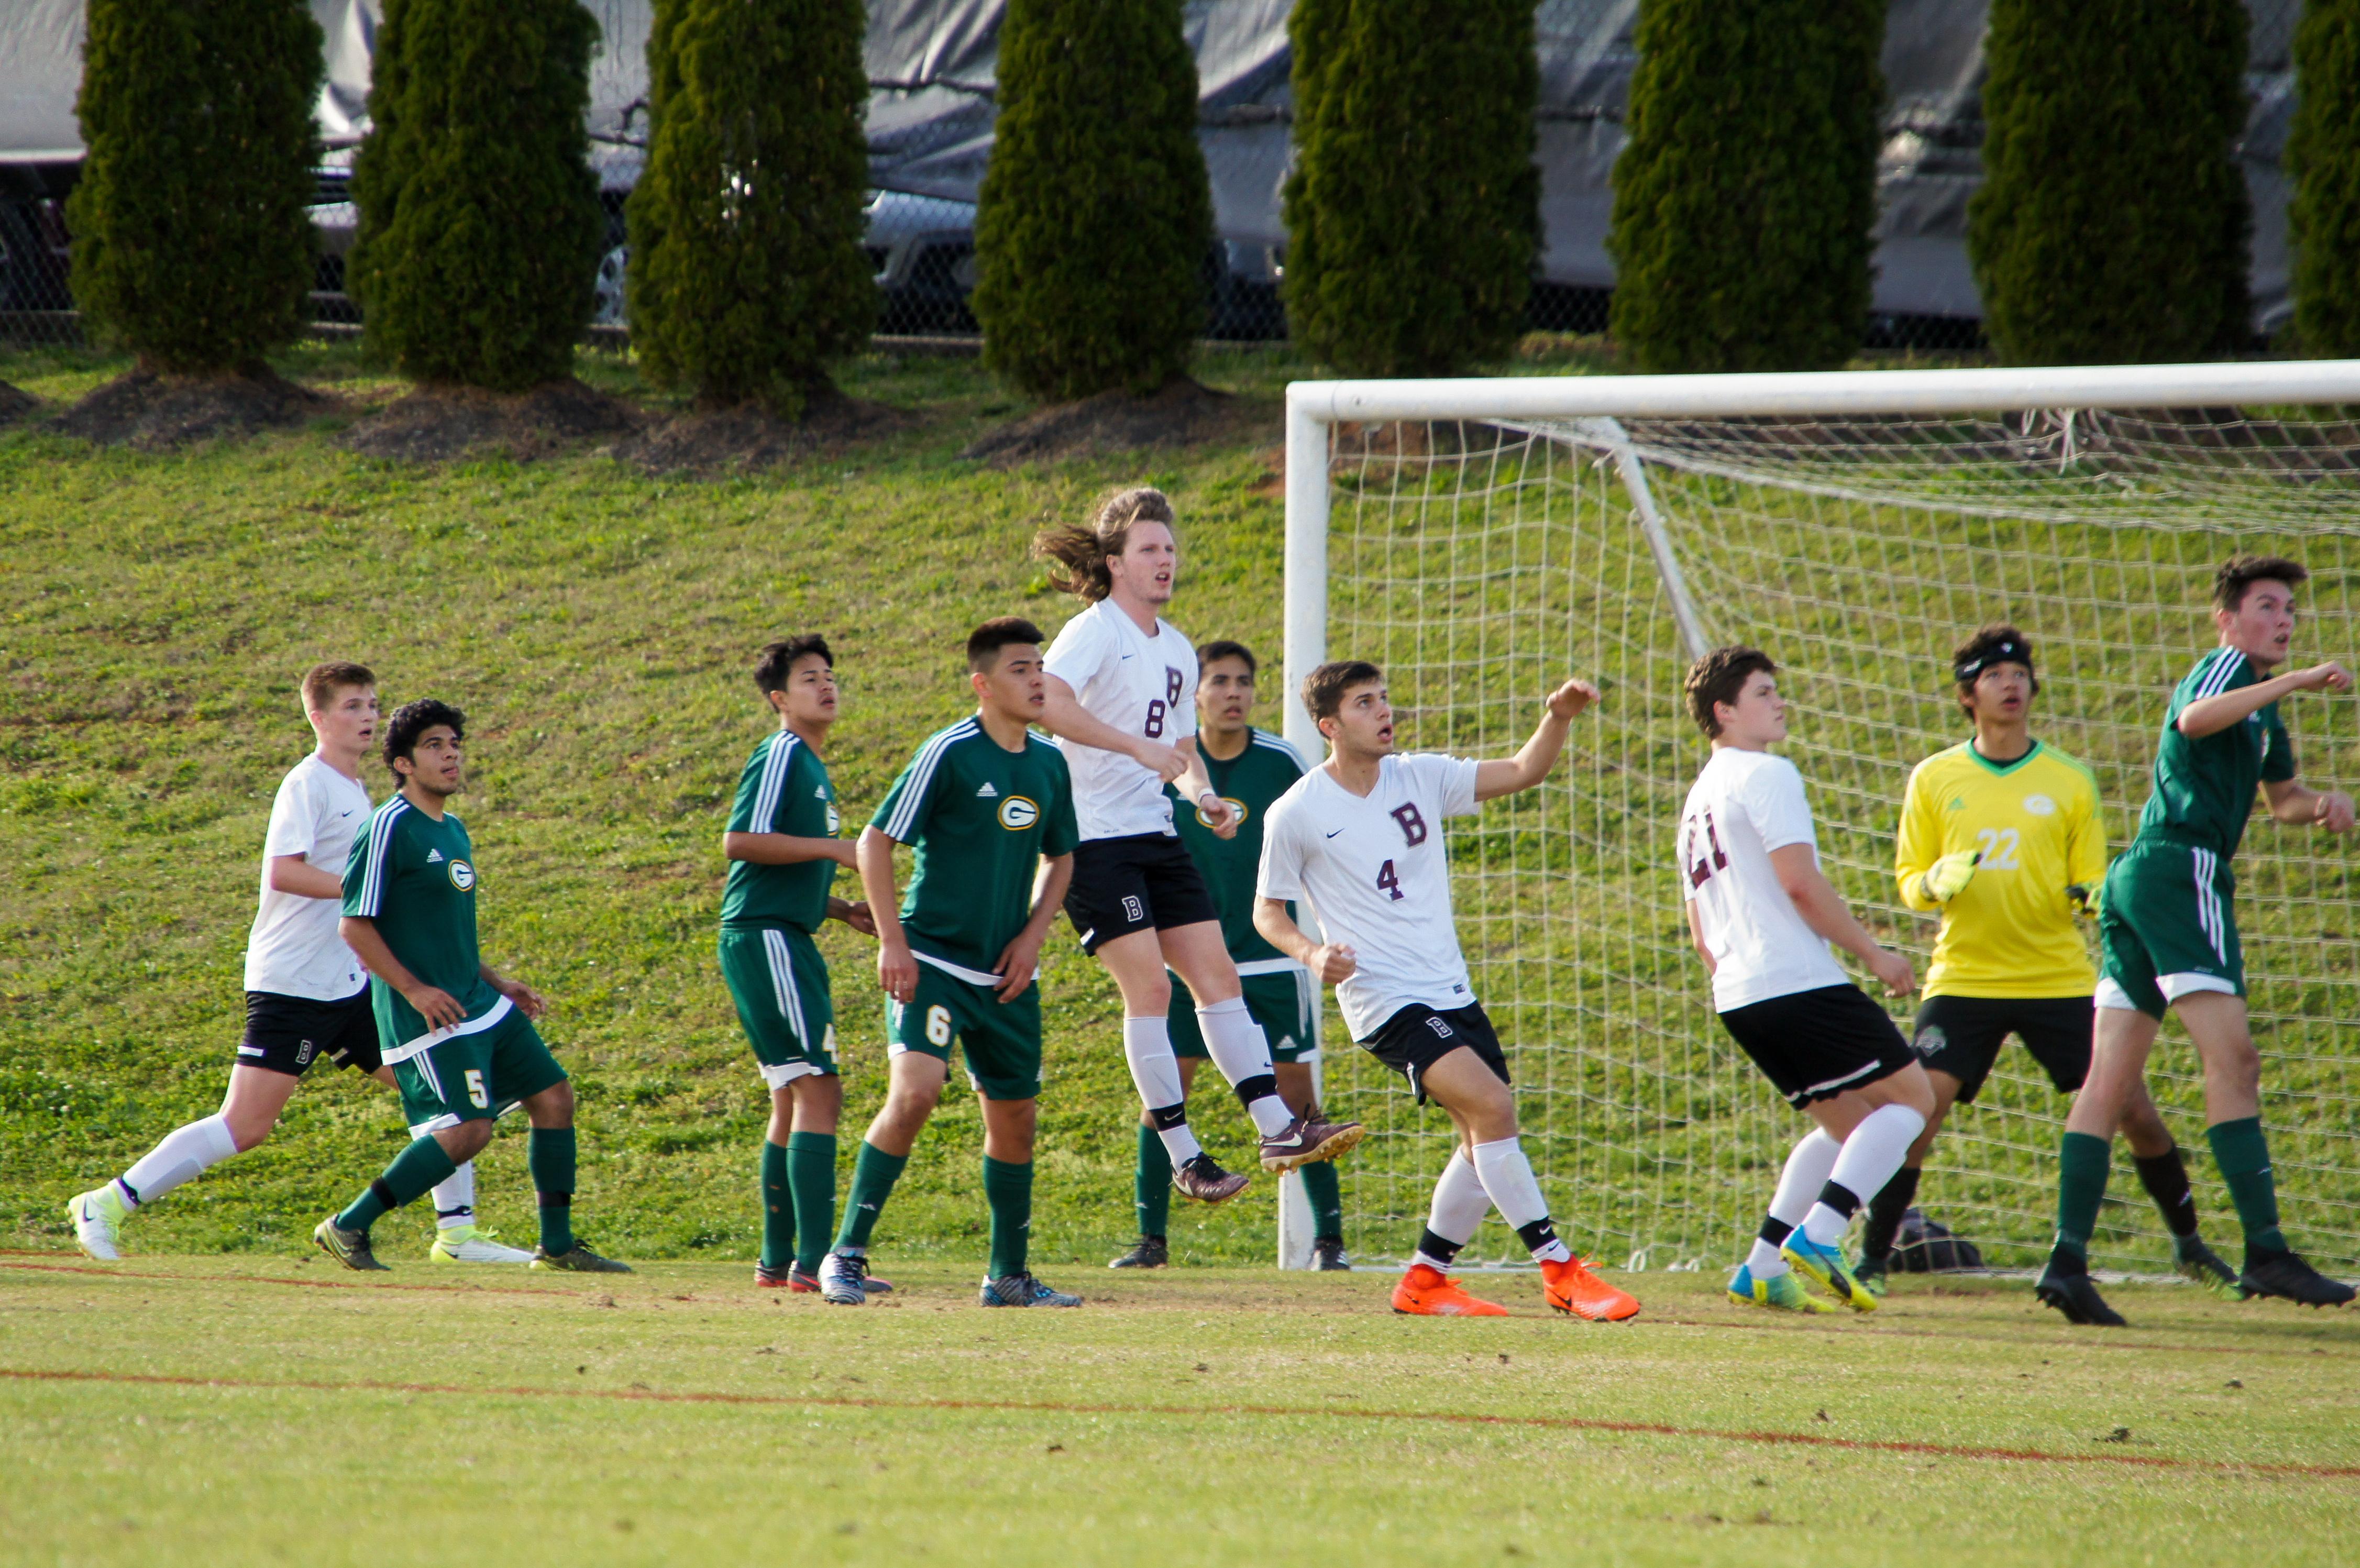 Bearden soccer looks to continue successful season against rival Farragut